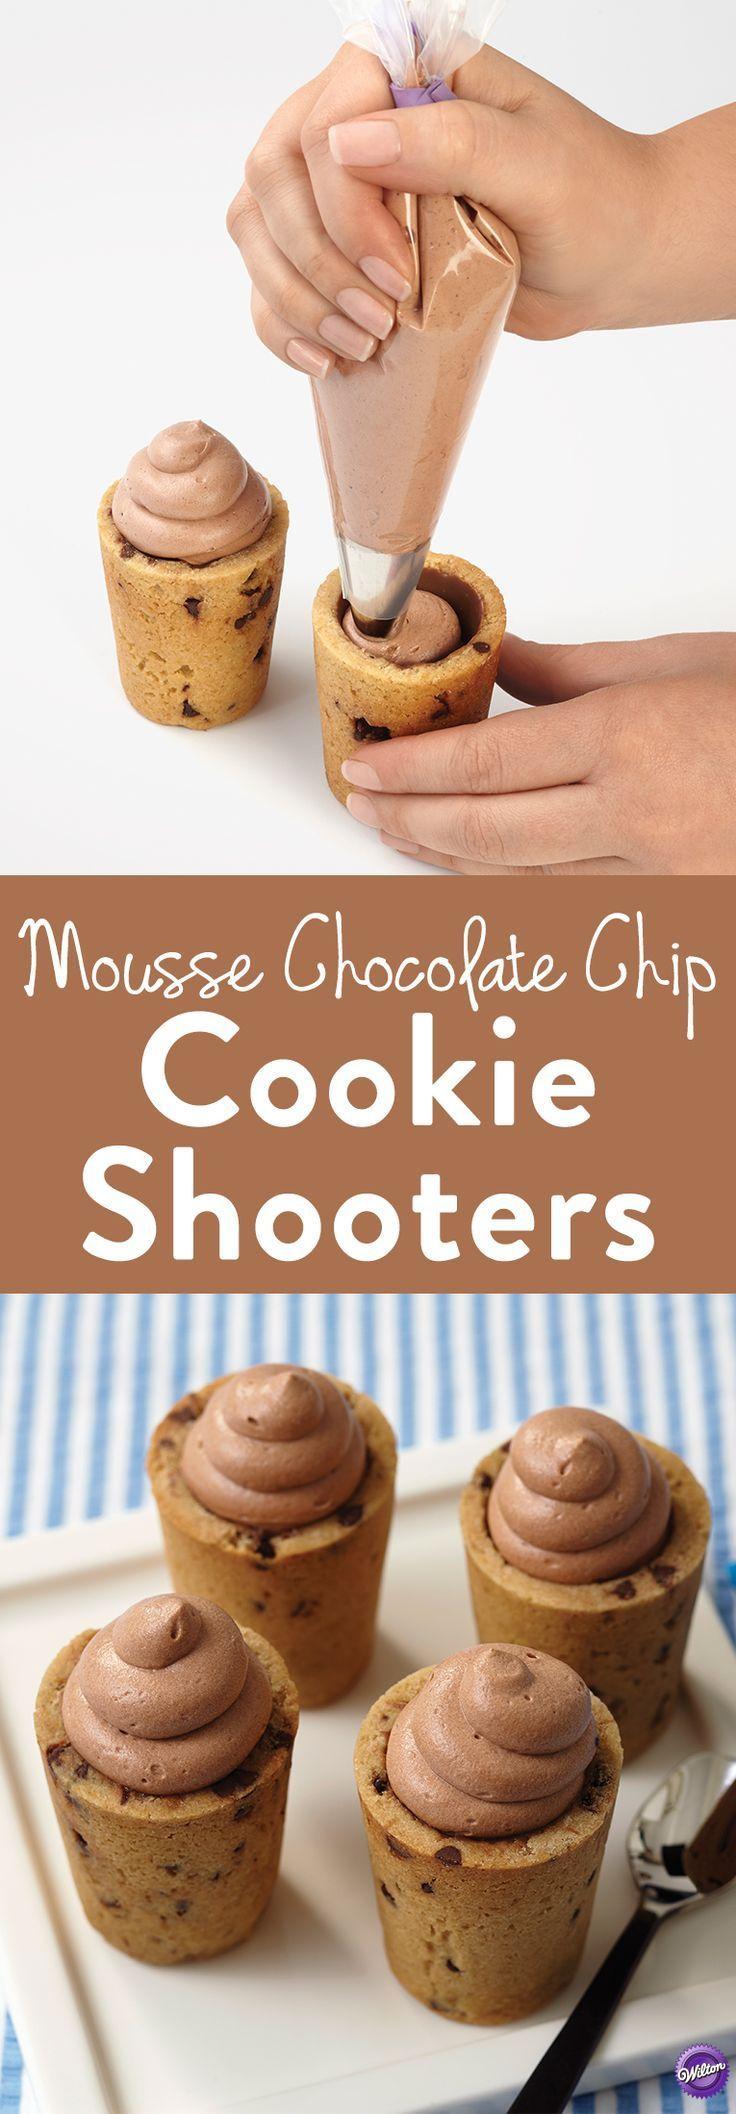 #chocolate #cookies #baking #dessert